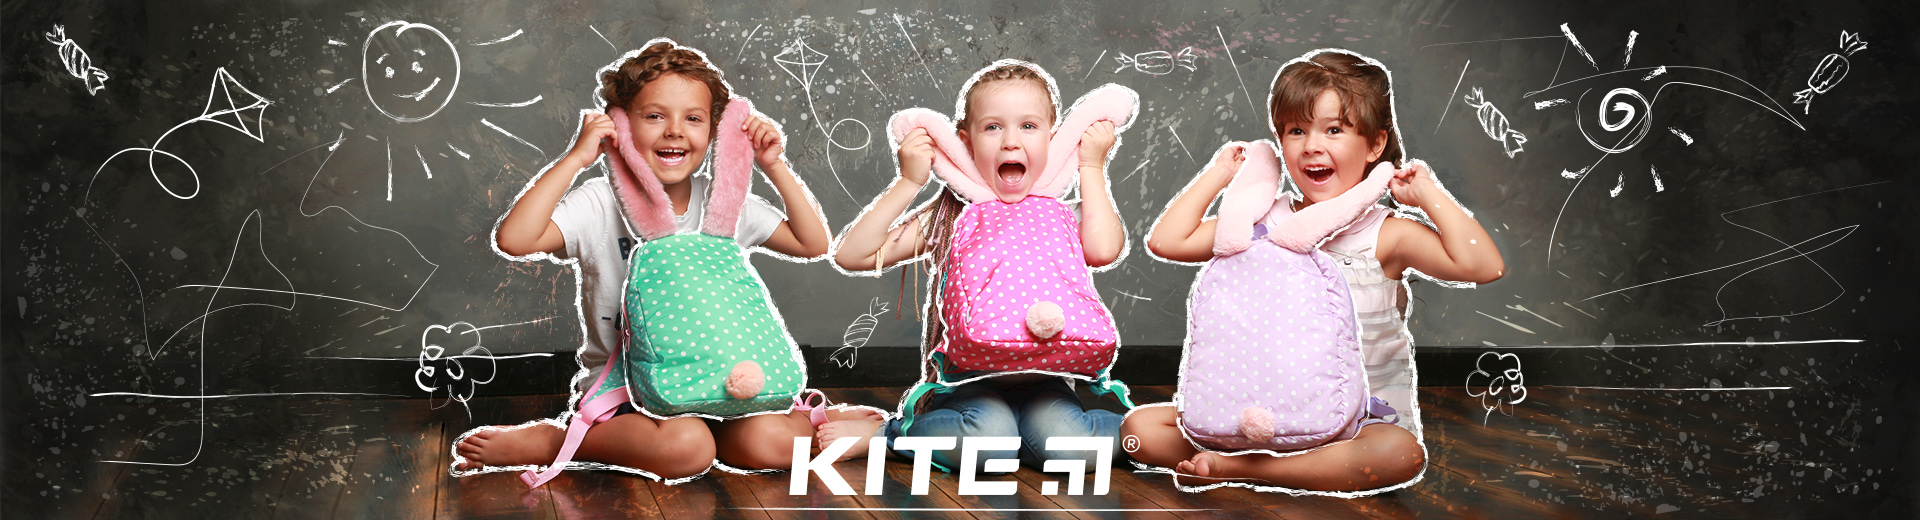 kids_new_0_1_